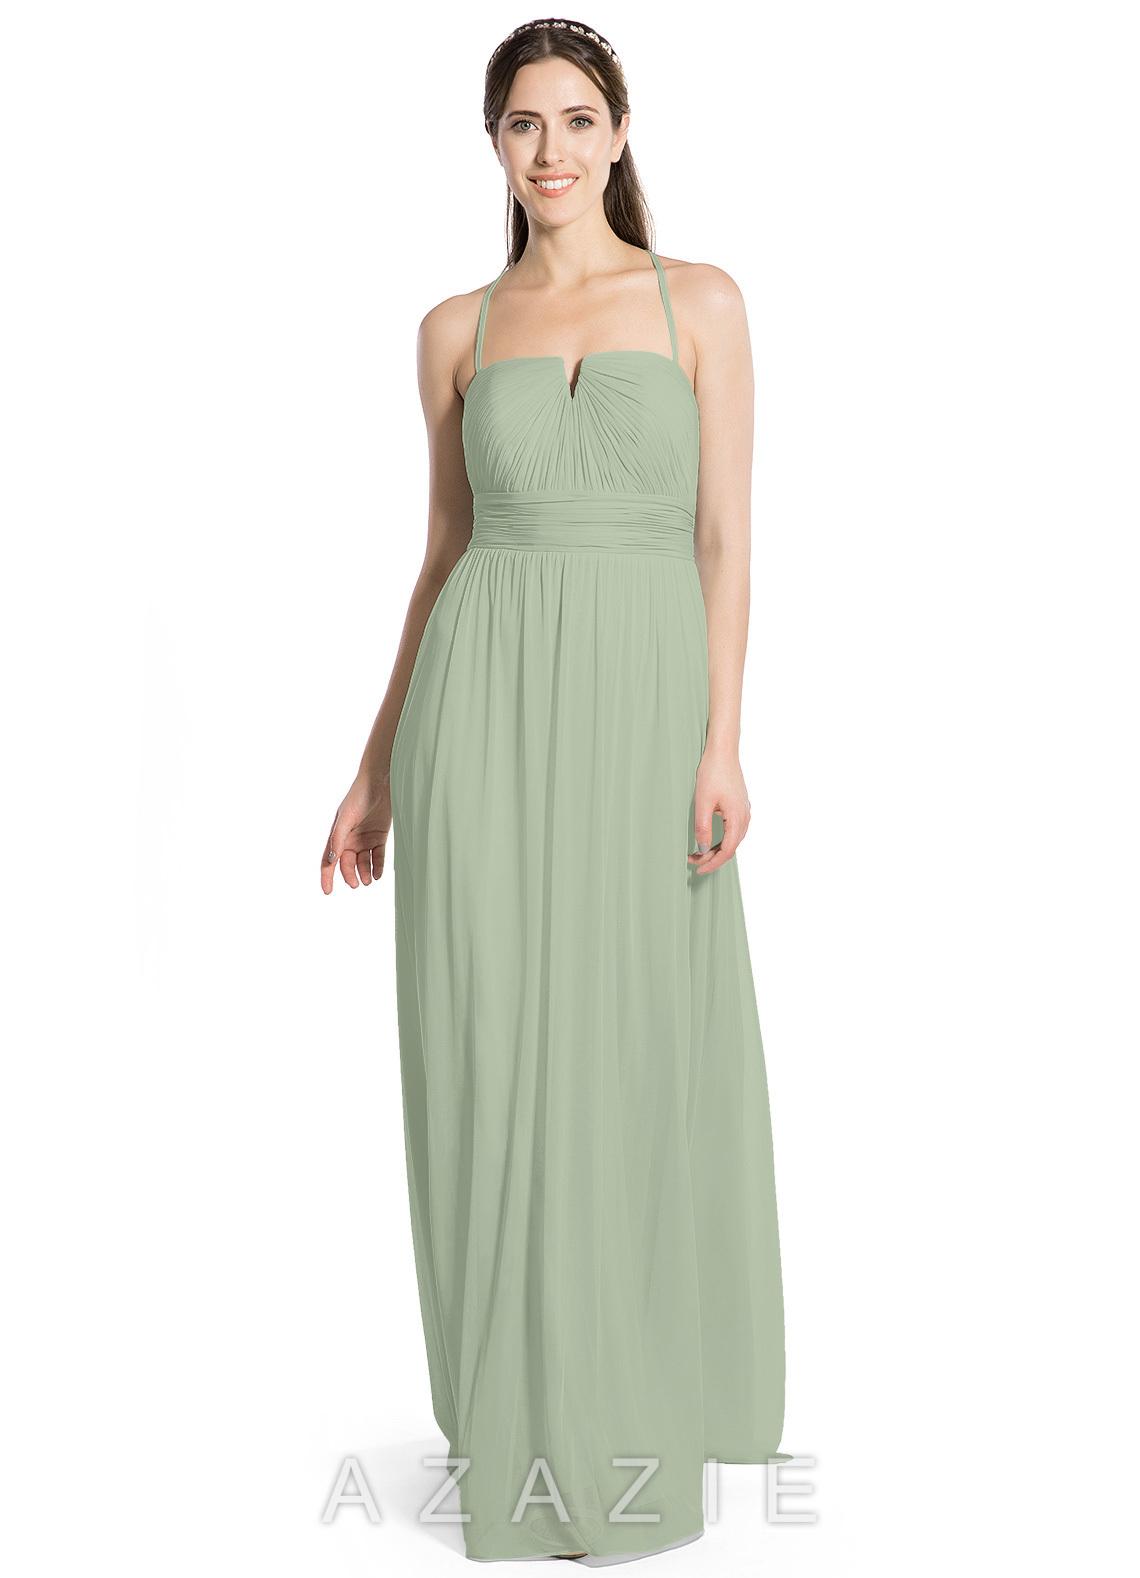 223dc644df1 Azazie Devin Bridesmaid Dress